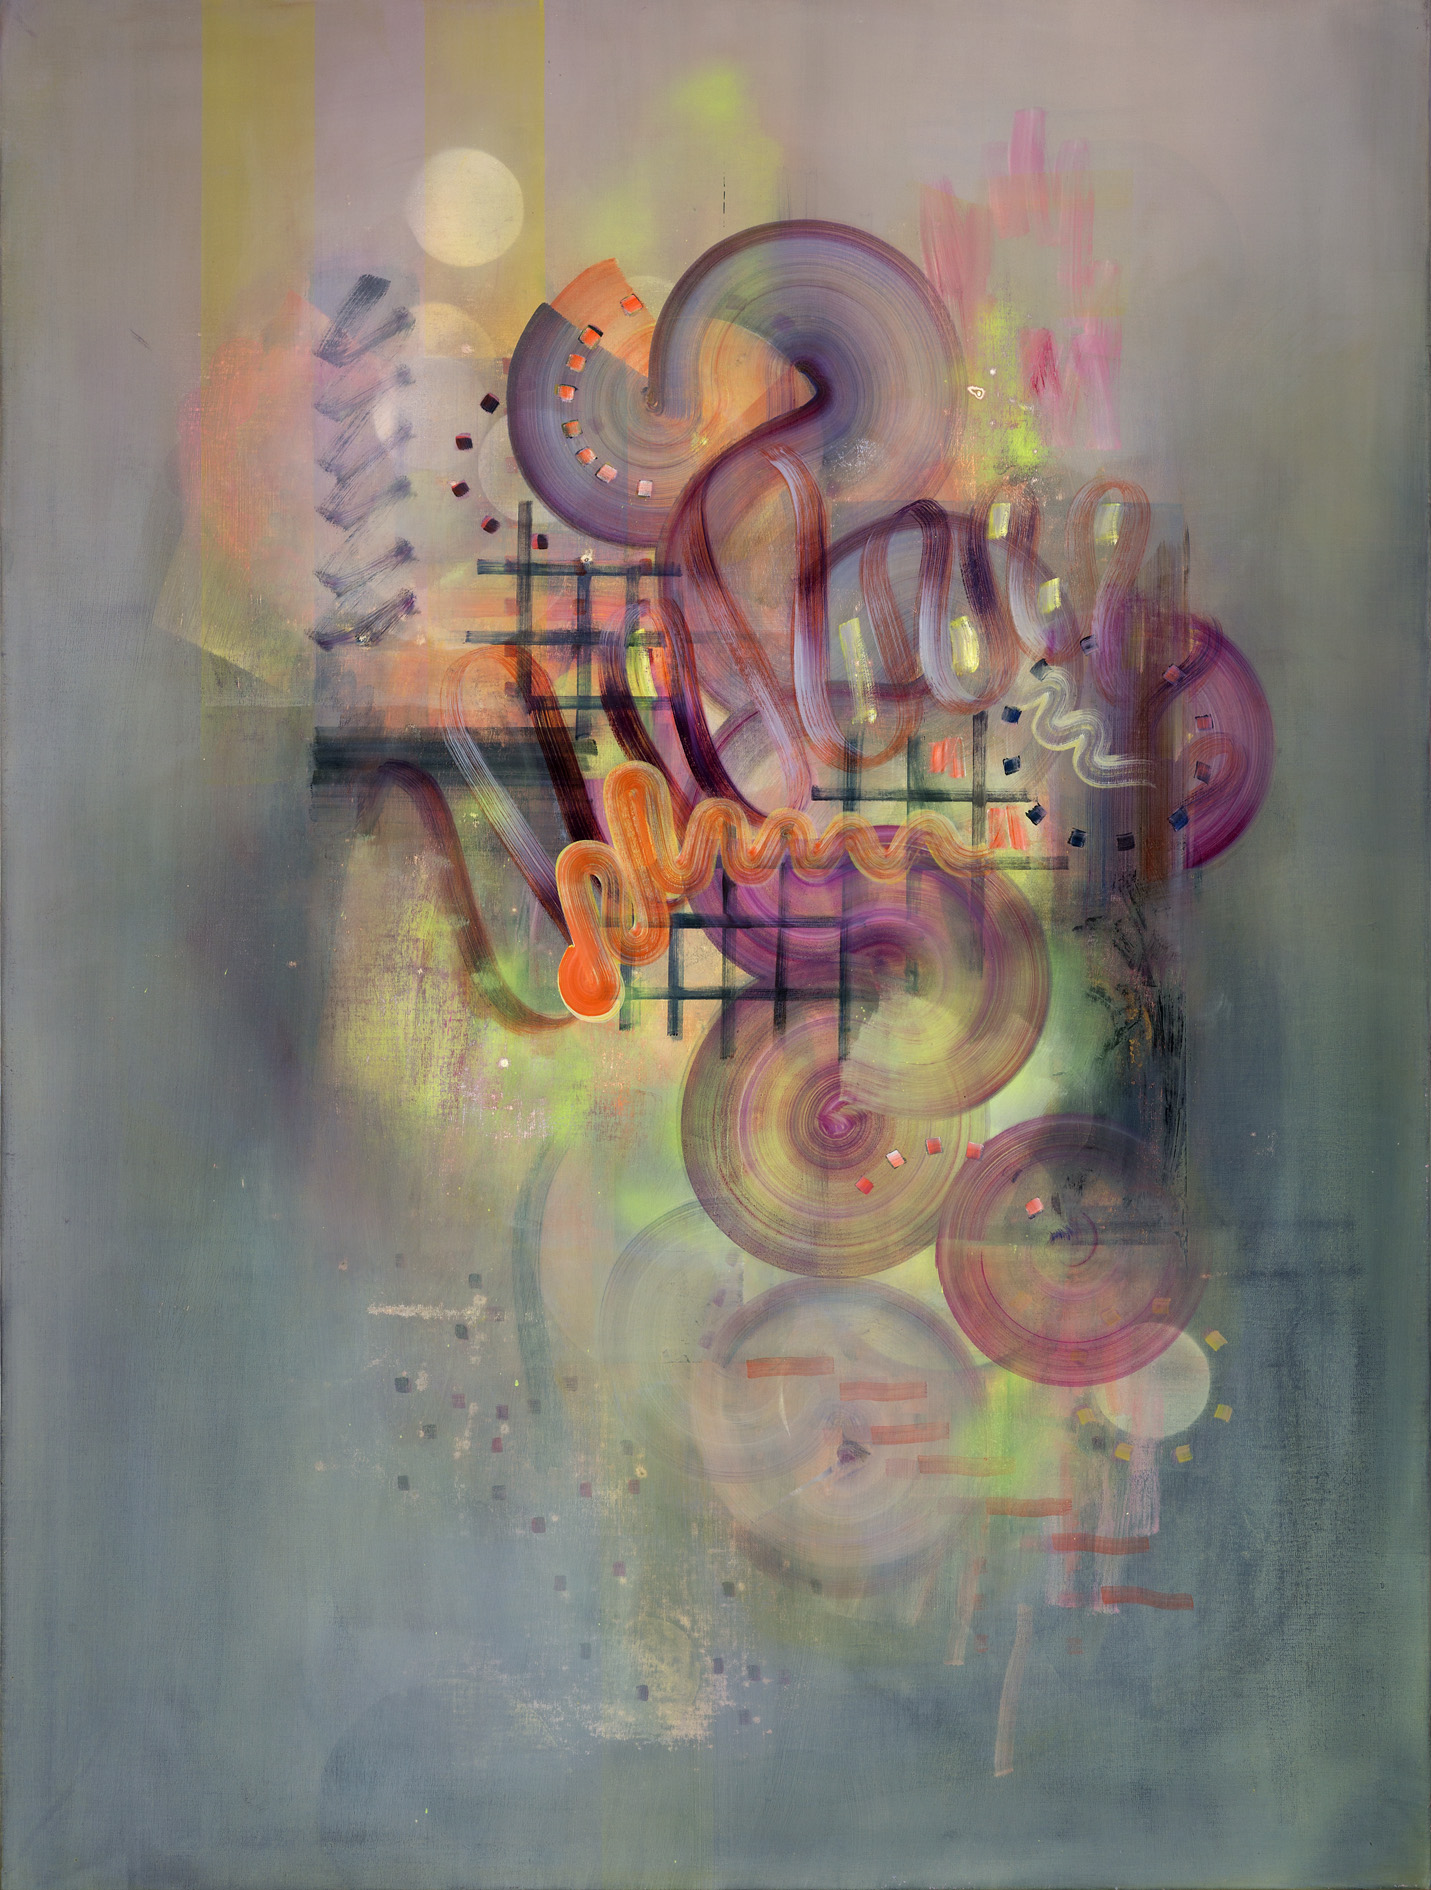 Baseline, 120cm x 90cm, oil and spray paint on linen, 2016